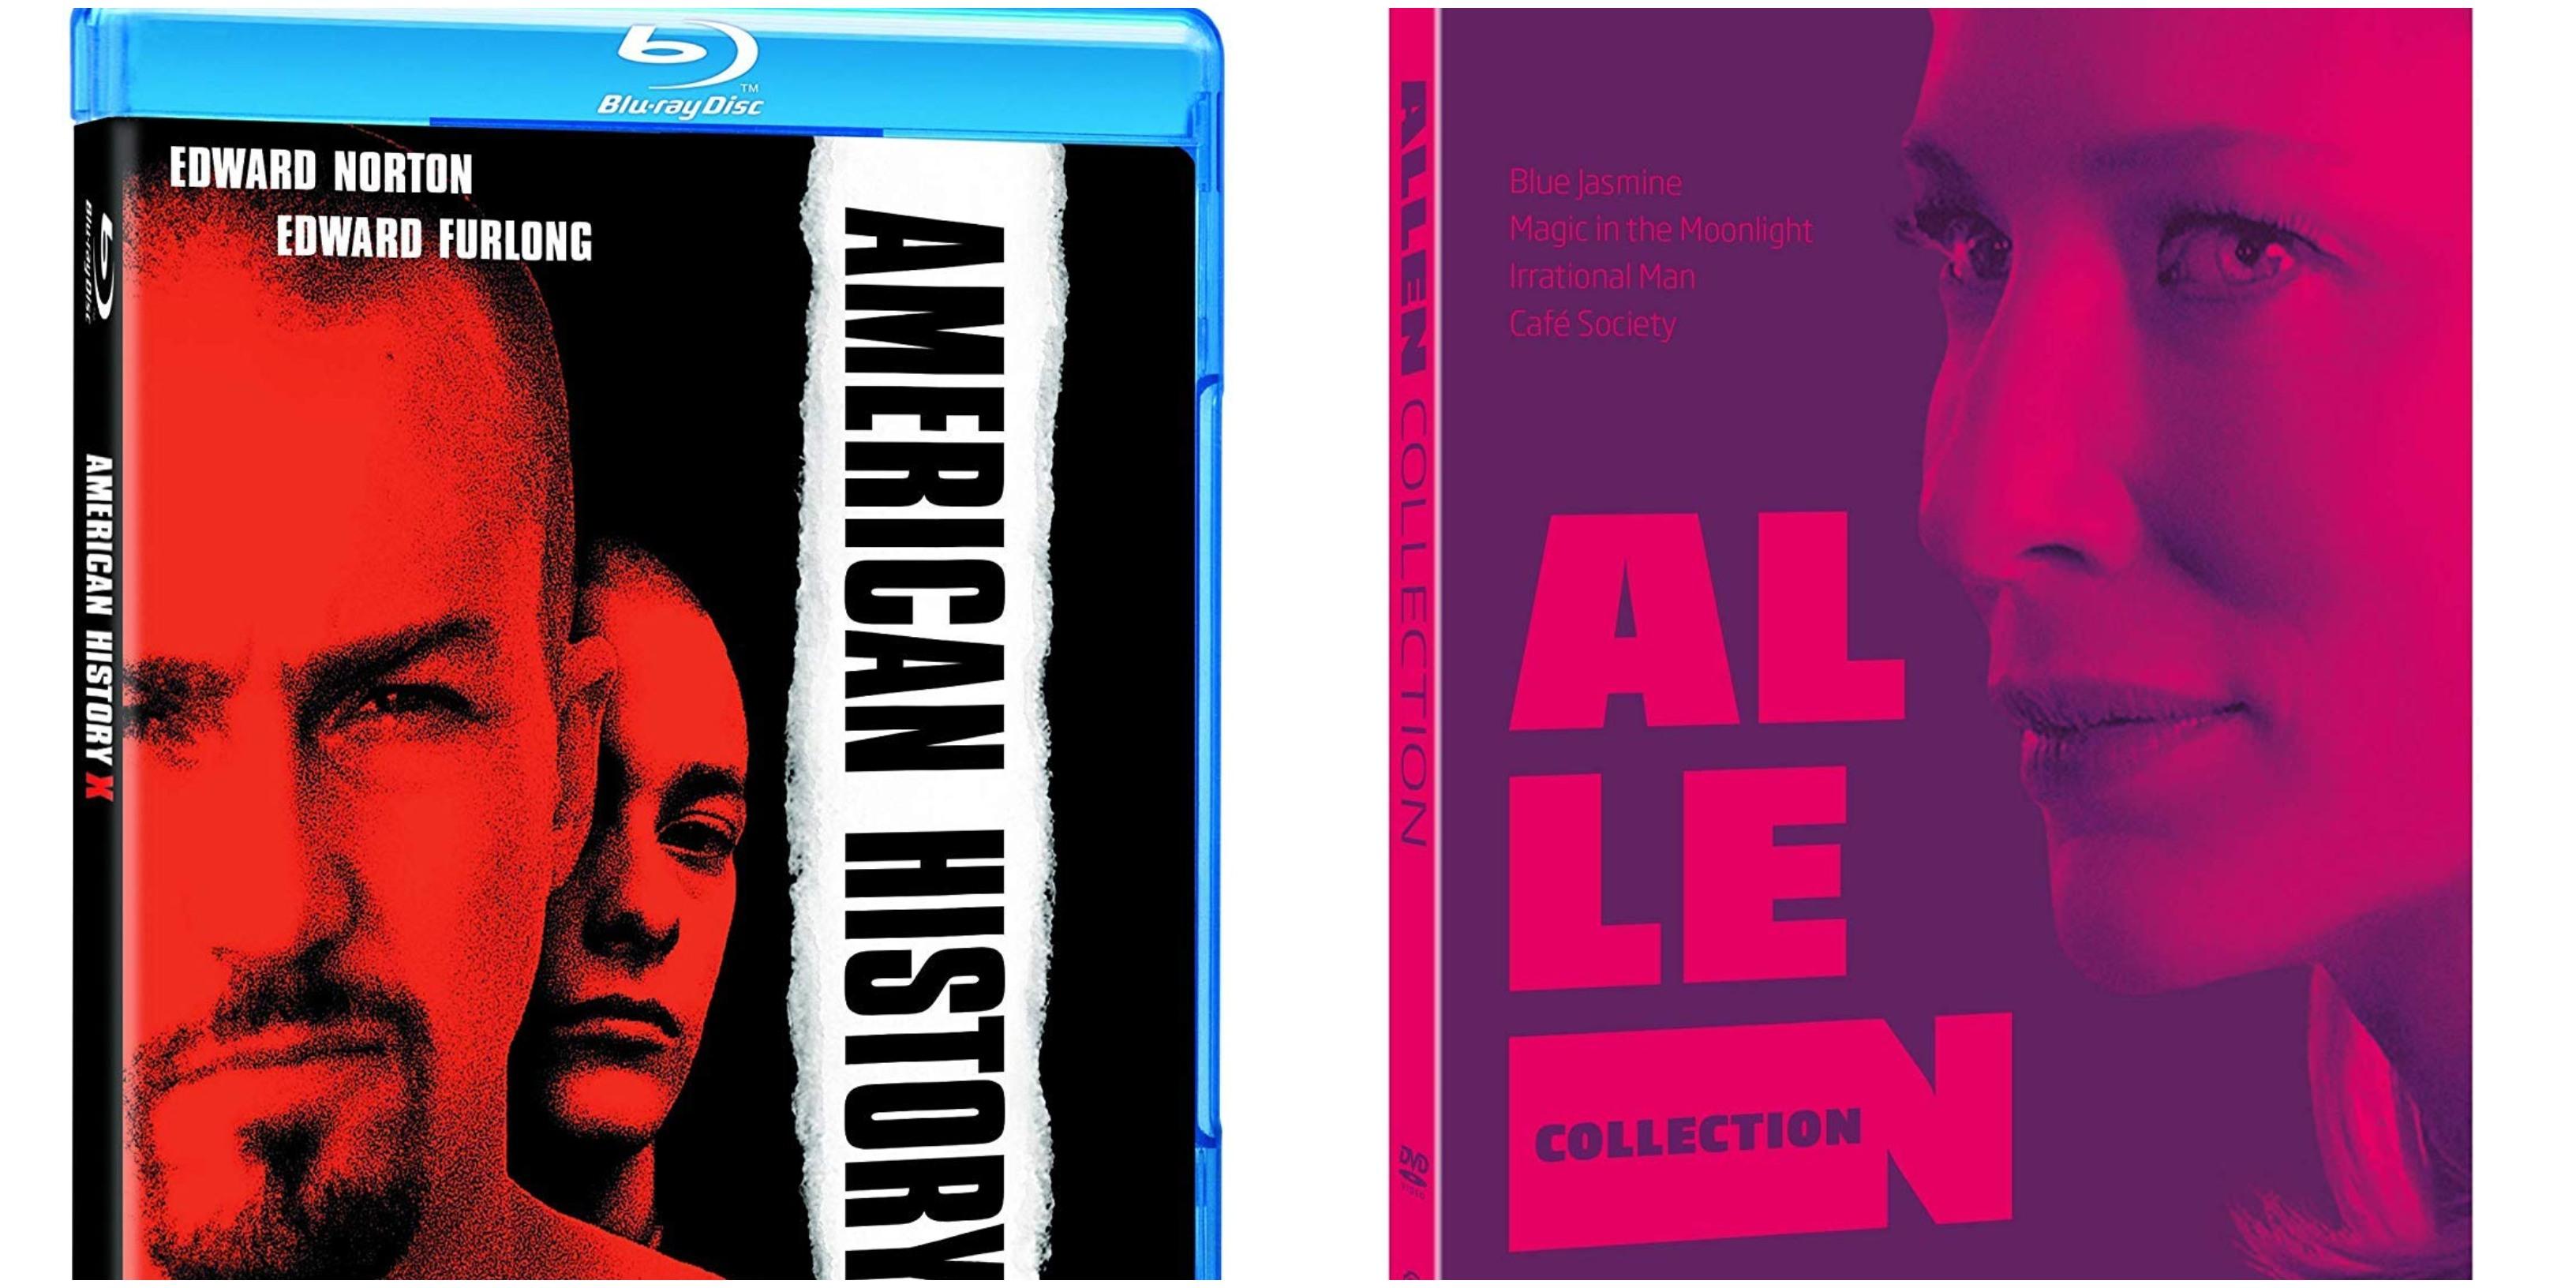 Home video novembre Warner Bros: American History X e Woody Allen